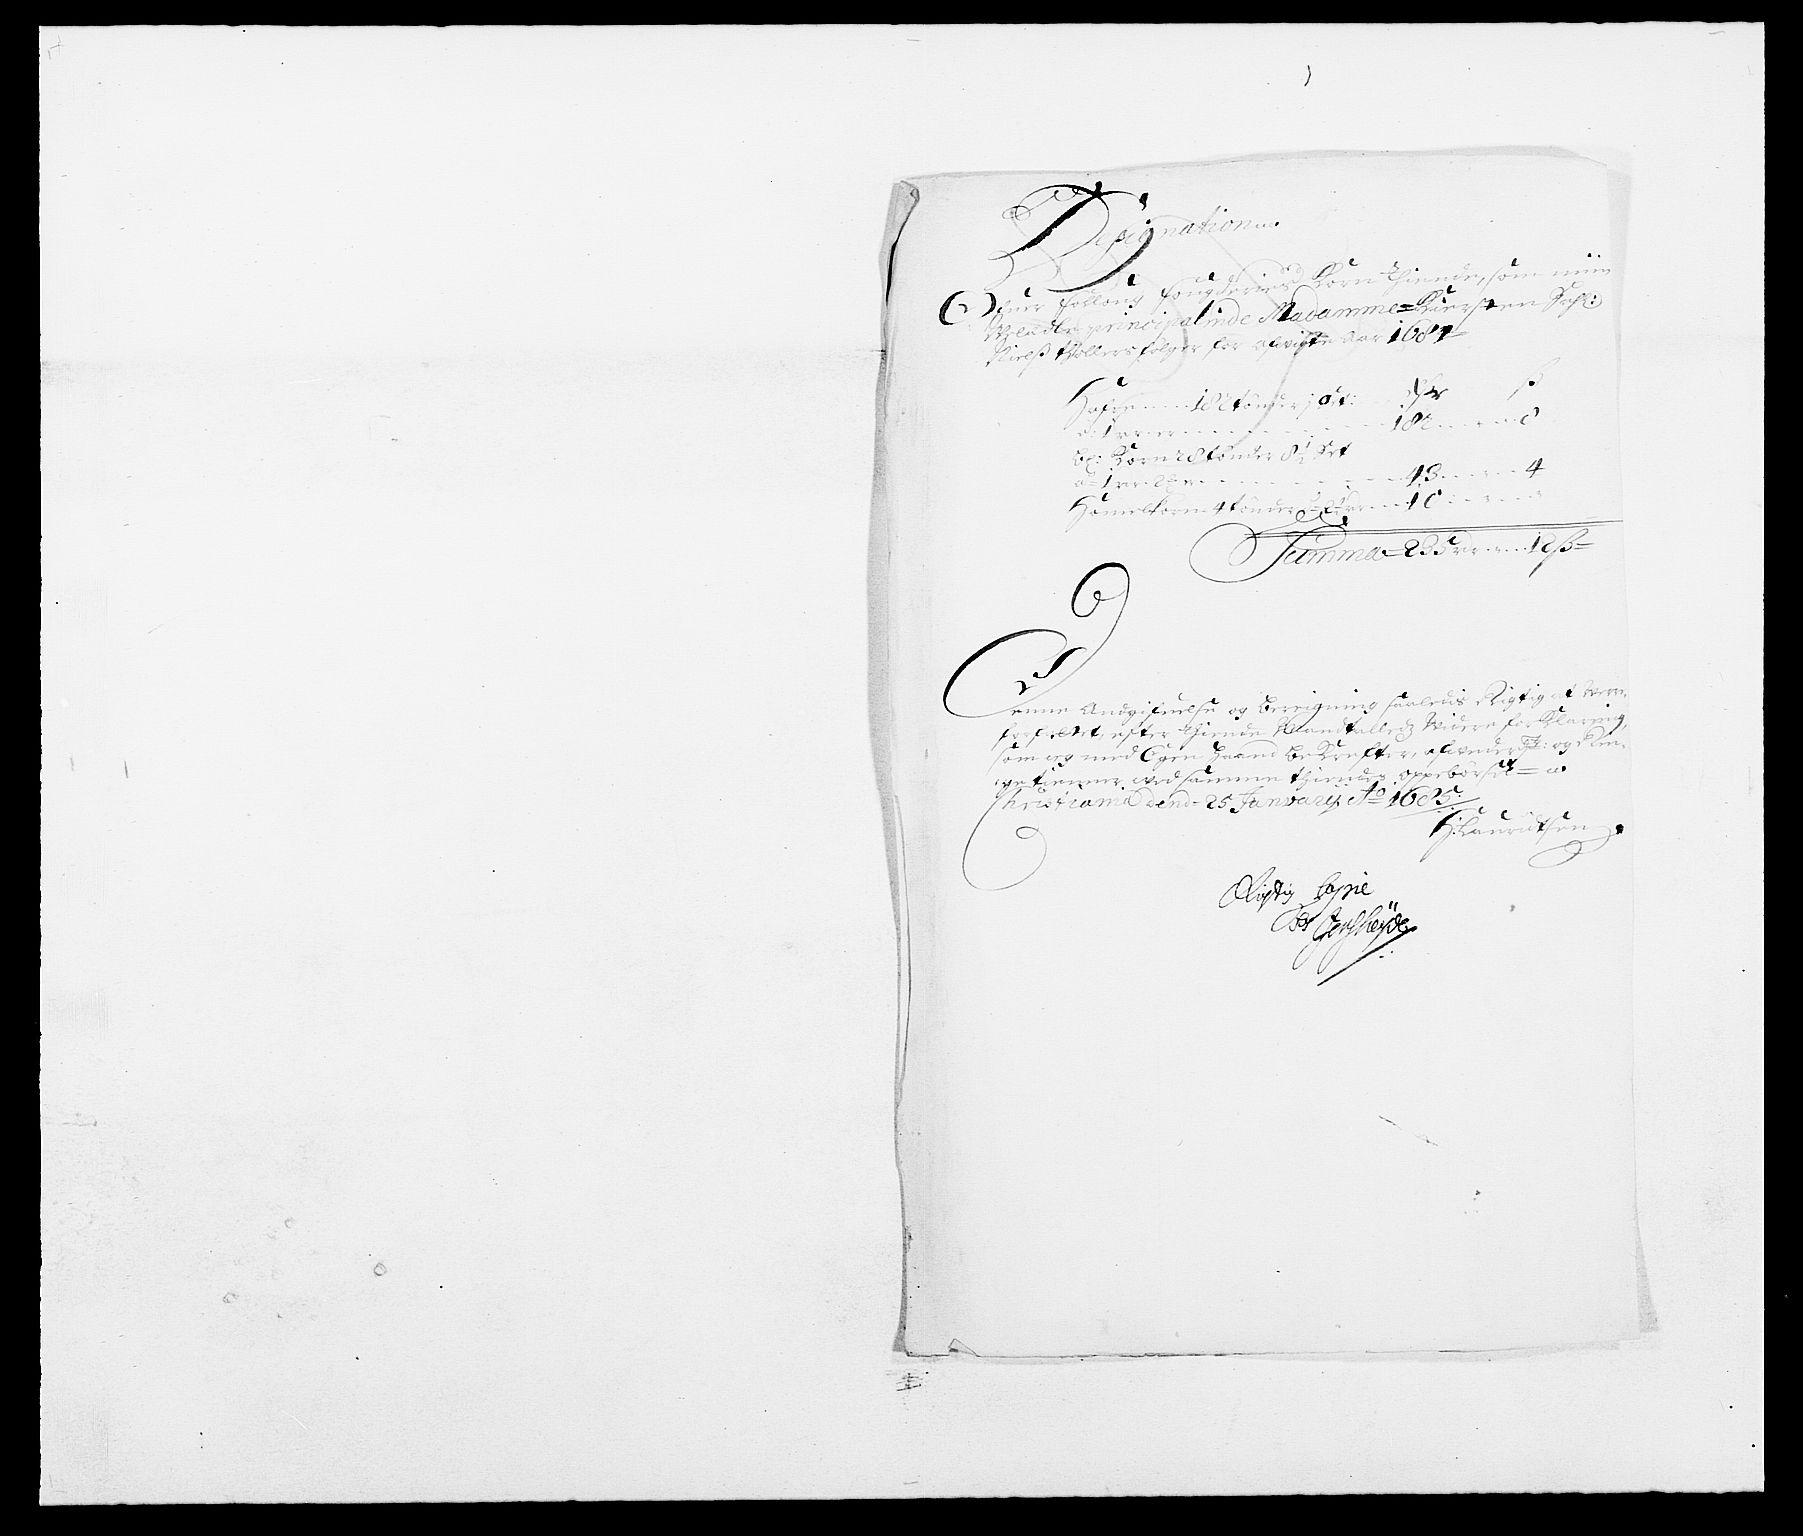 RA, Rentekammeret inntil 1814, Reviderte regnskaper, Fogderegnskap, R09/L0431: Fogderegnskap Follo, 1684, s. 187